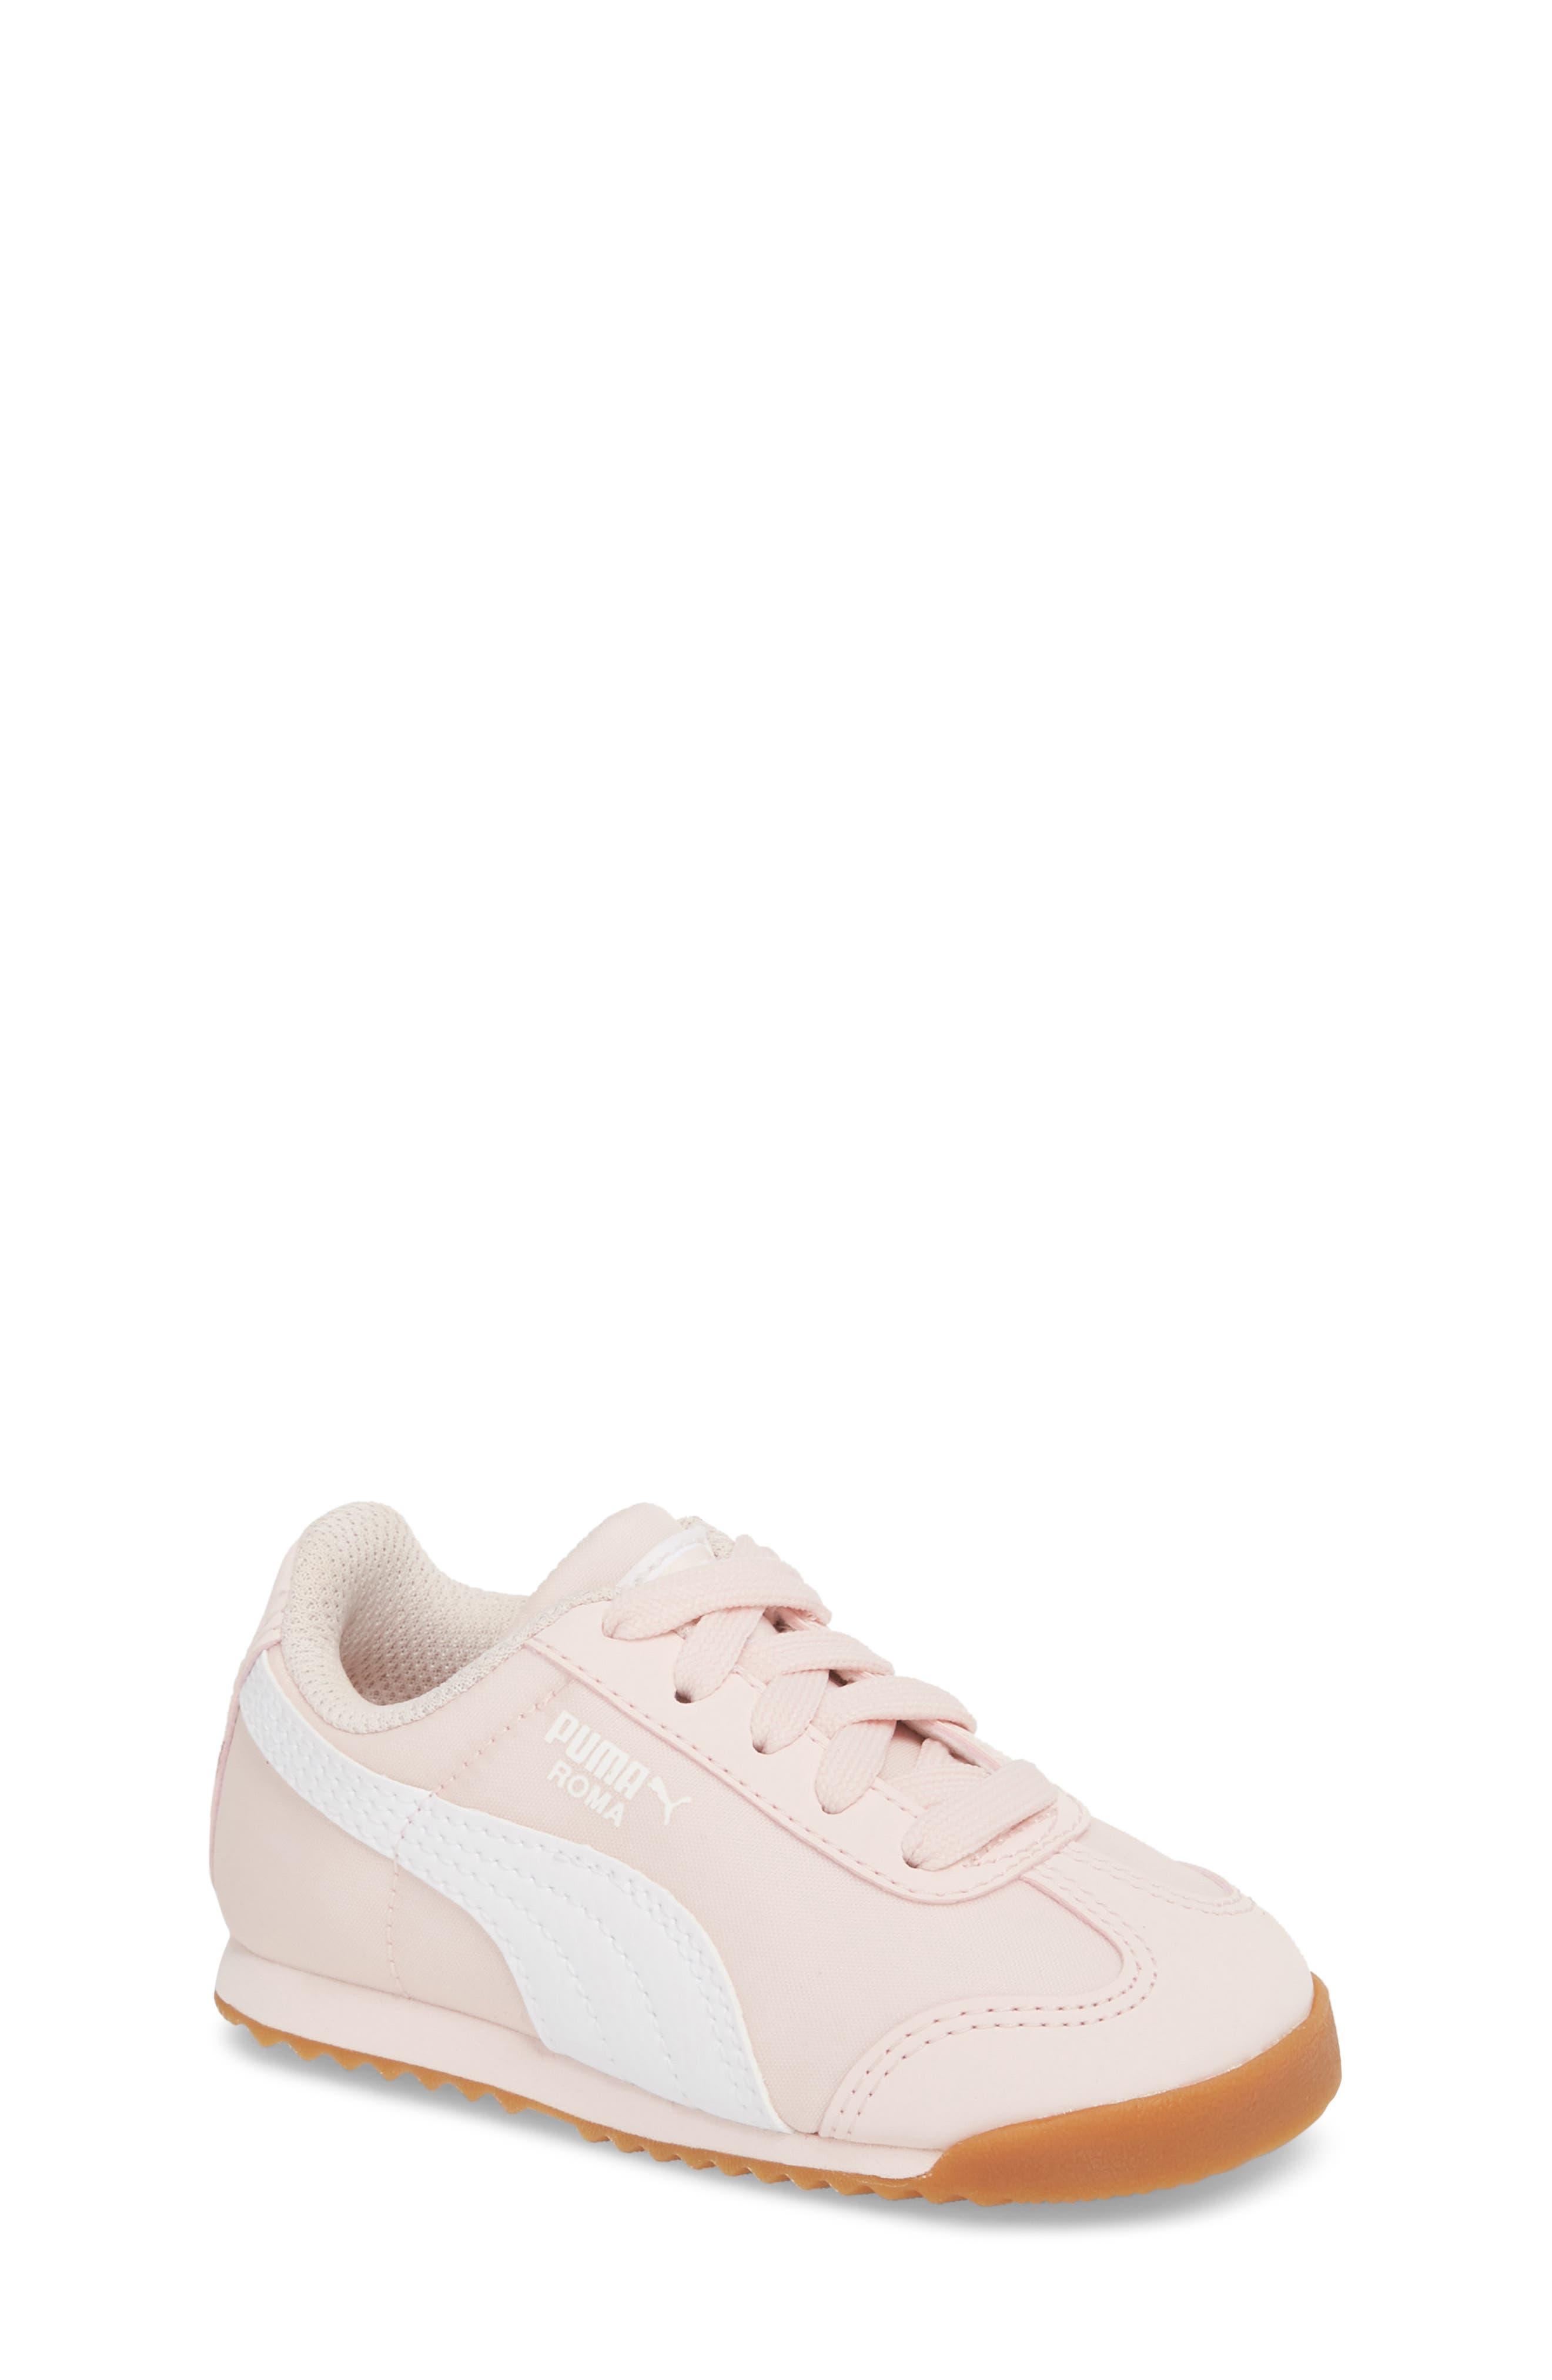 PUMA,                             Roma Basic Summer Sneaker,                             Main thumbnail 1, color,                             100